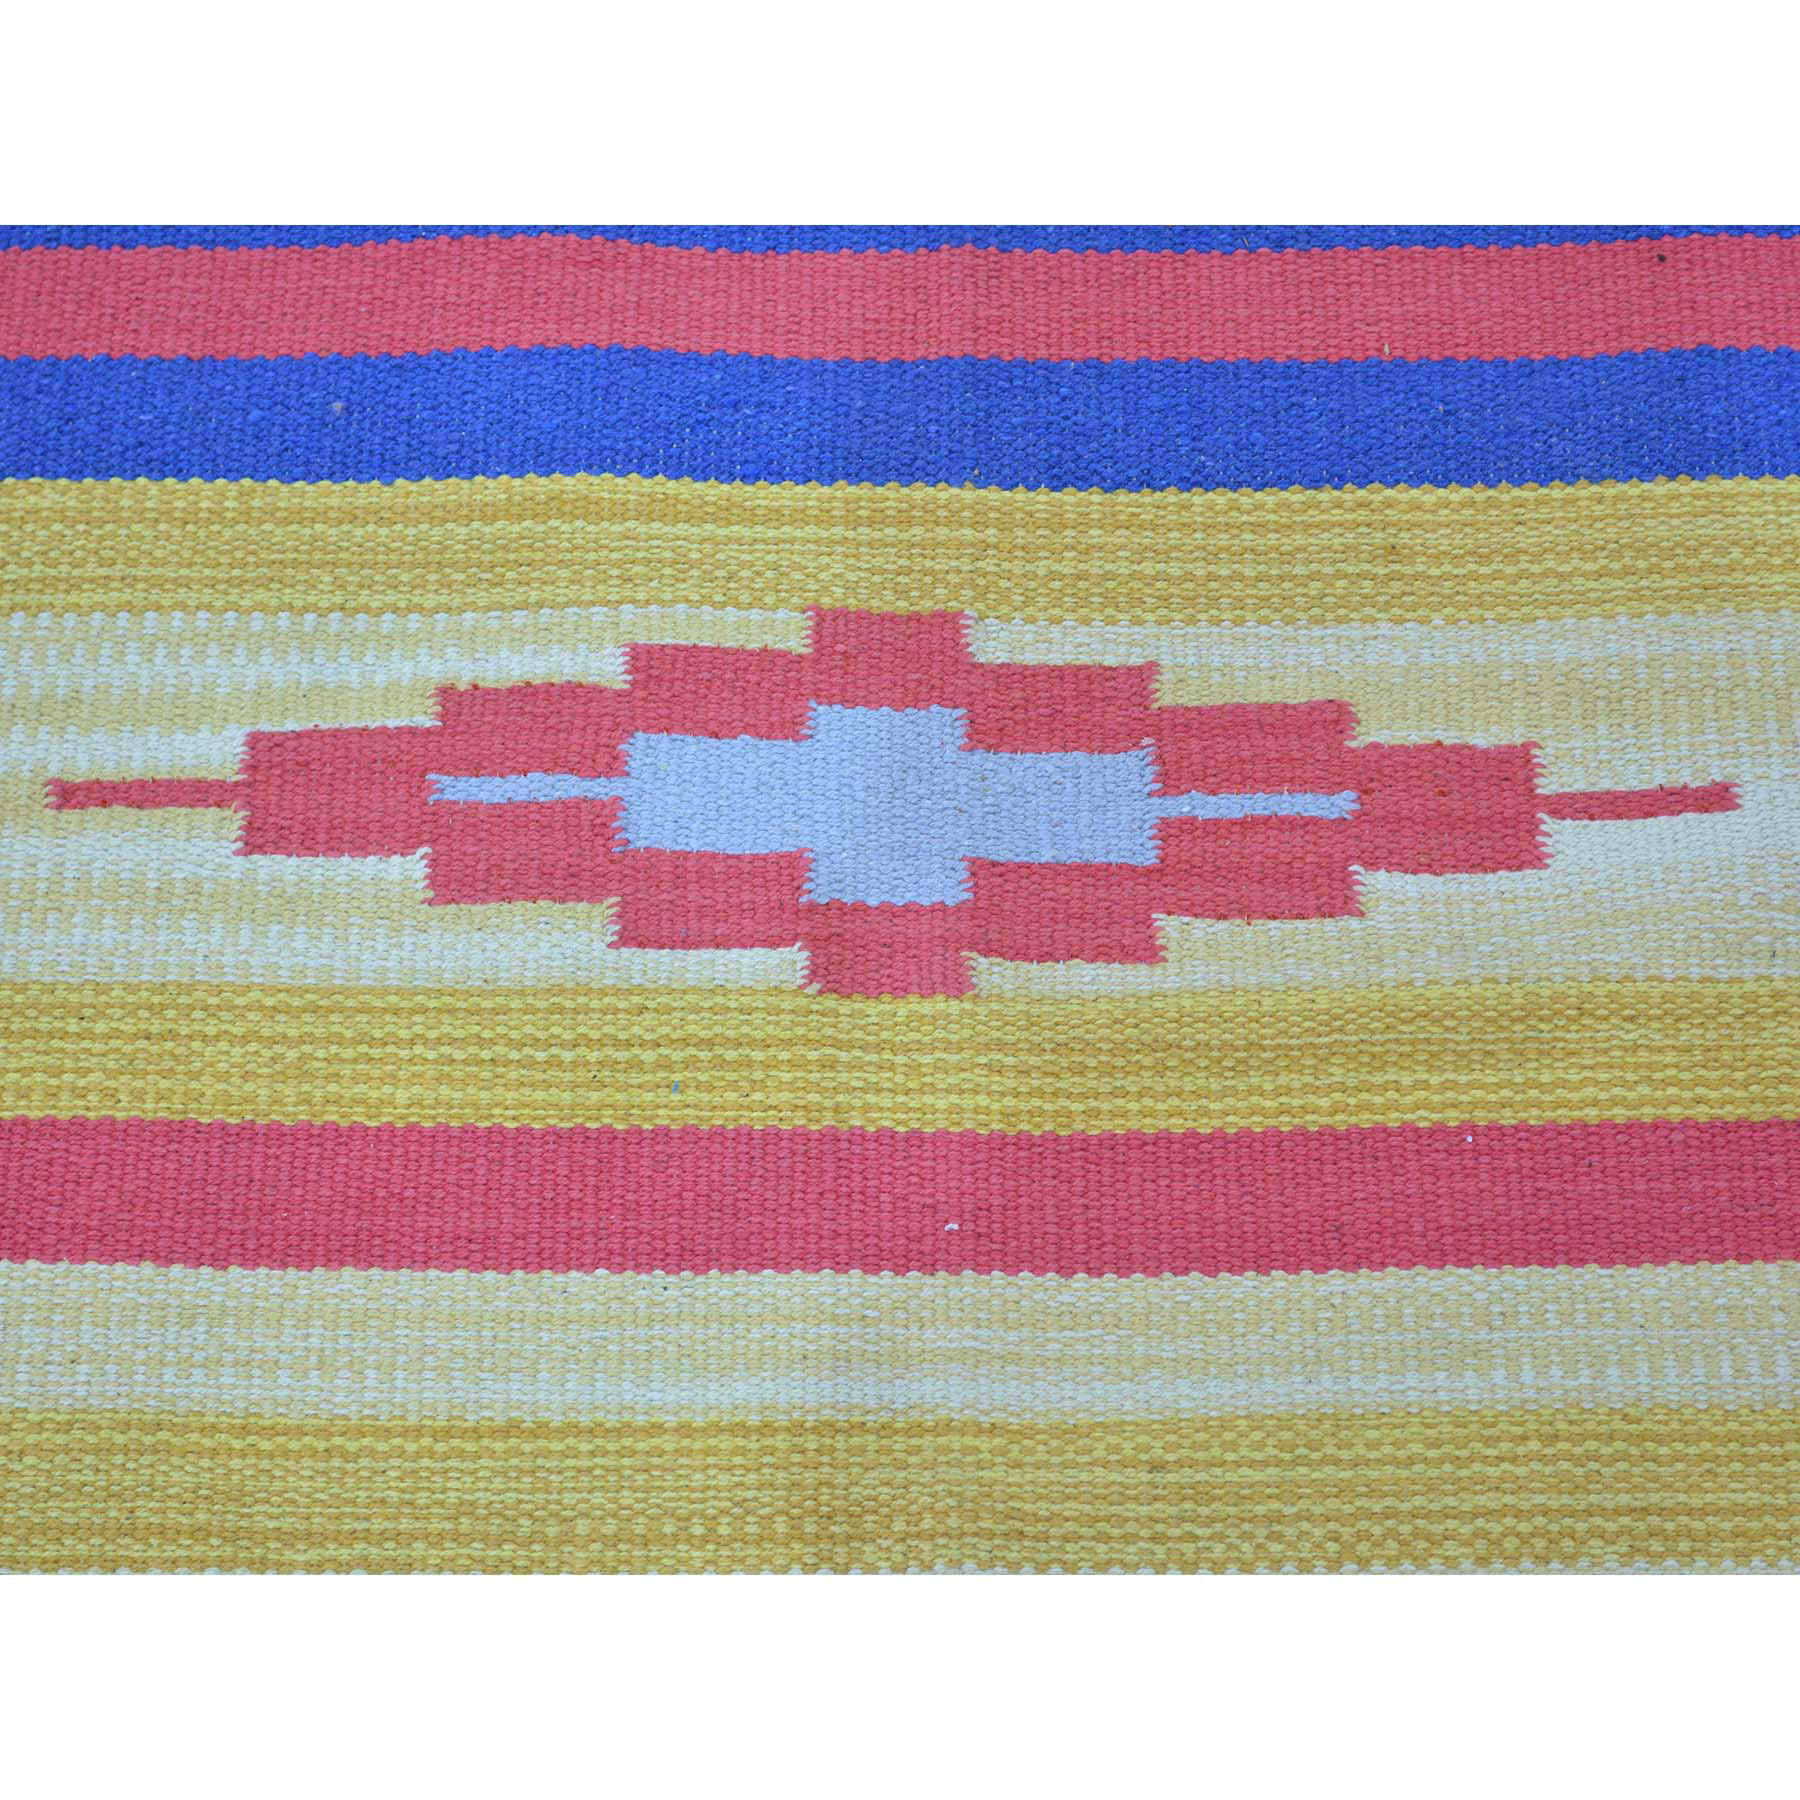 8-x10-1  Flat Weave Hand Woven Killim Southwestern Design Rug